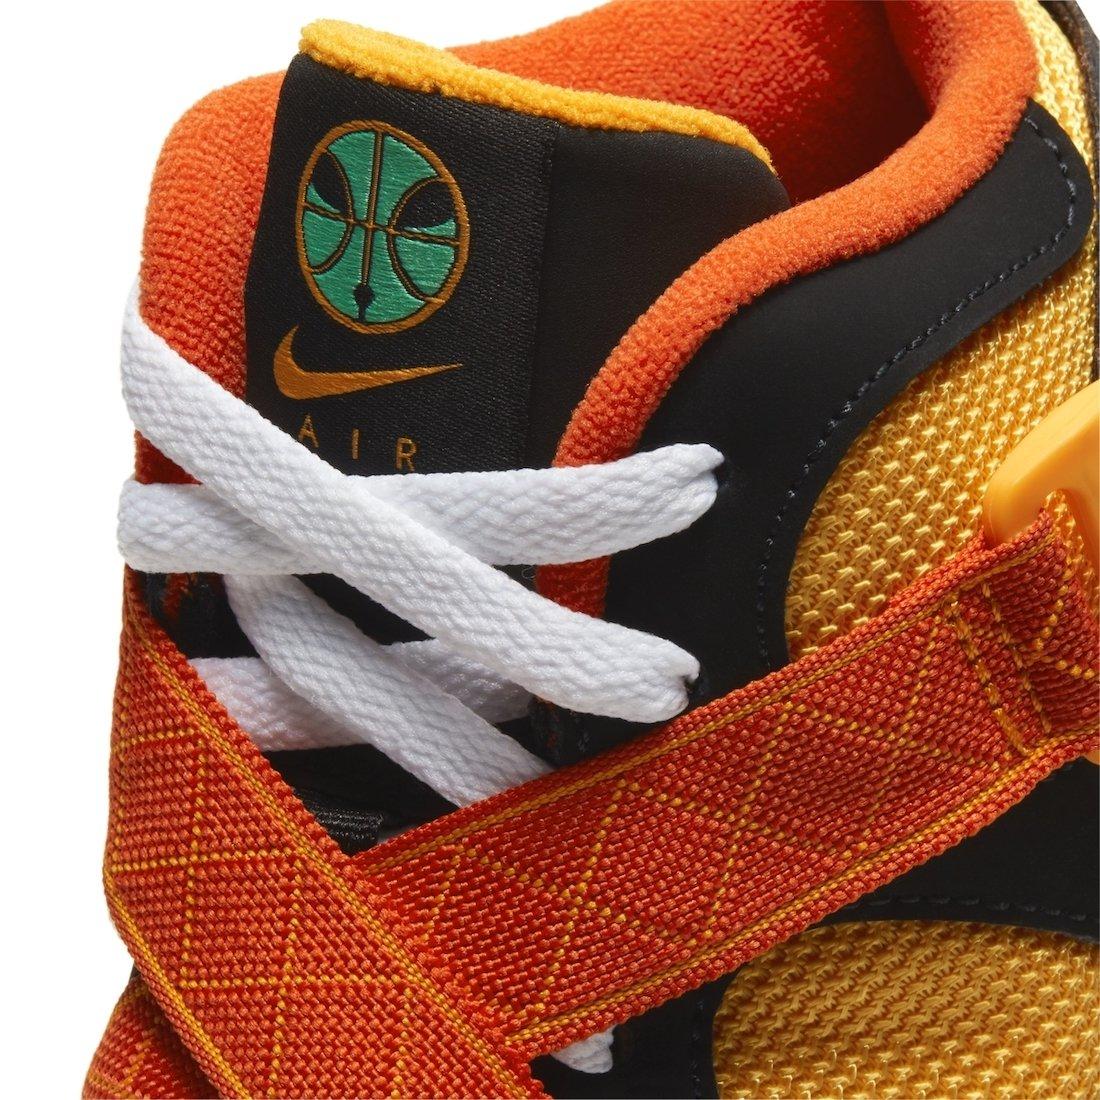 Nike Air Raid Rayguns Release Date Info